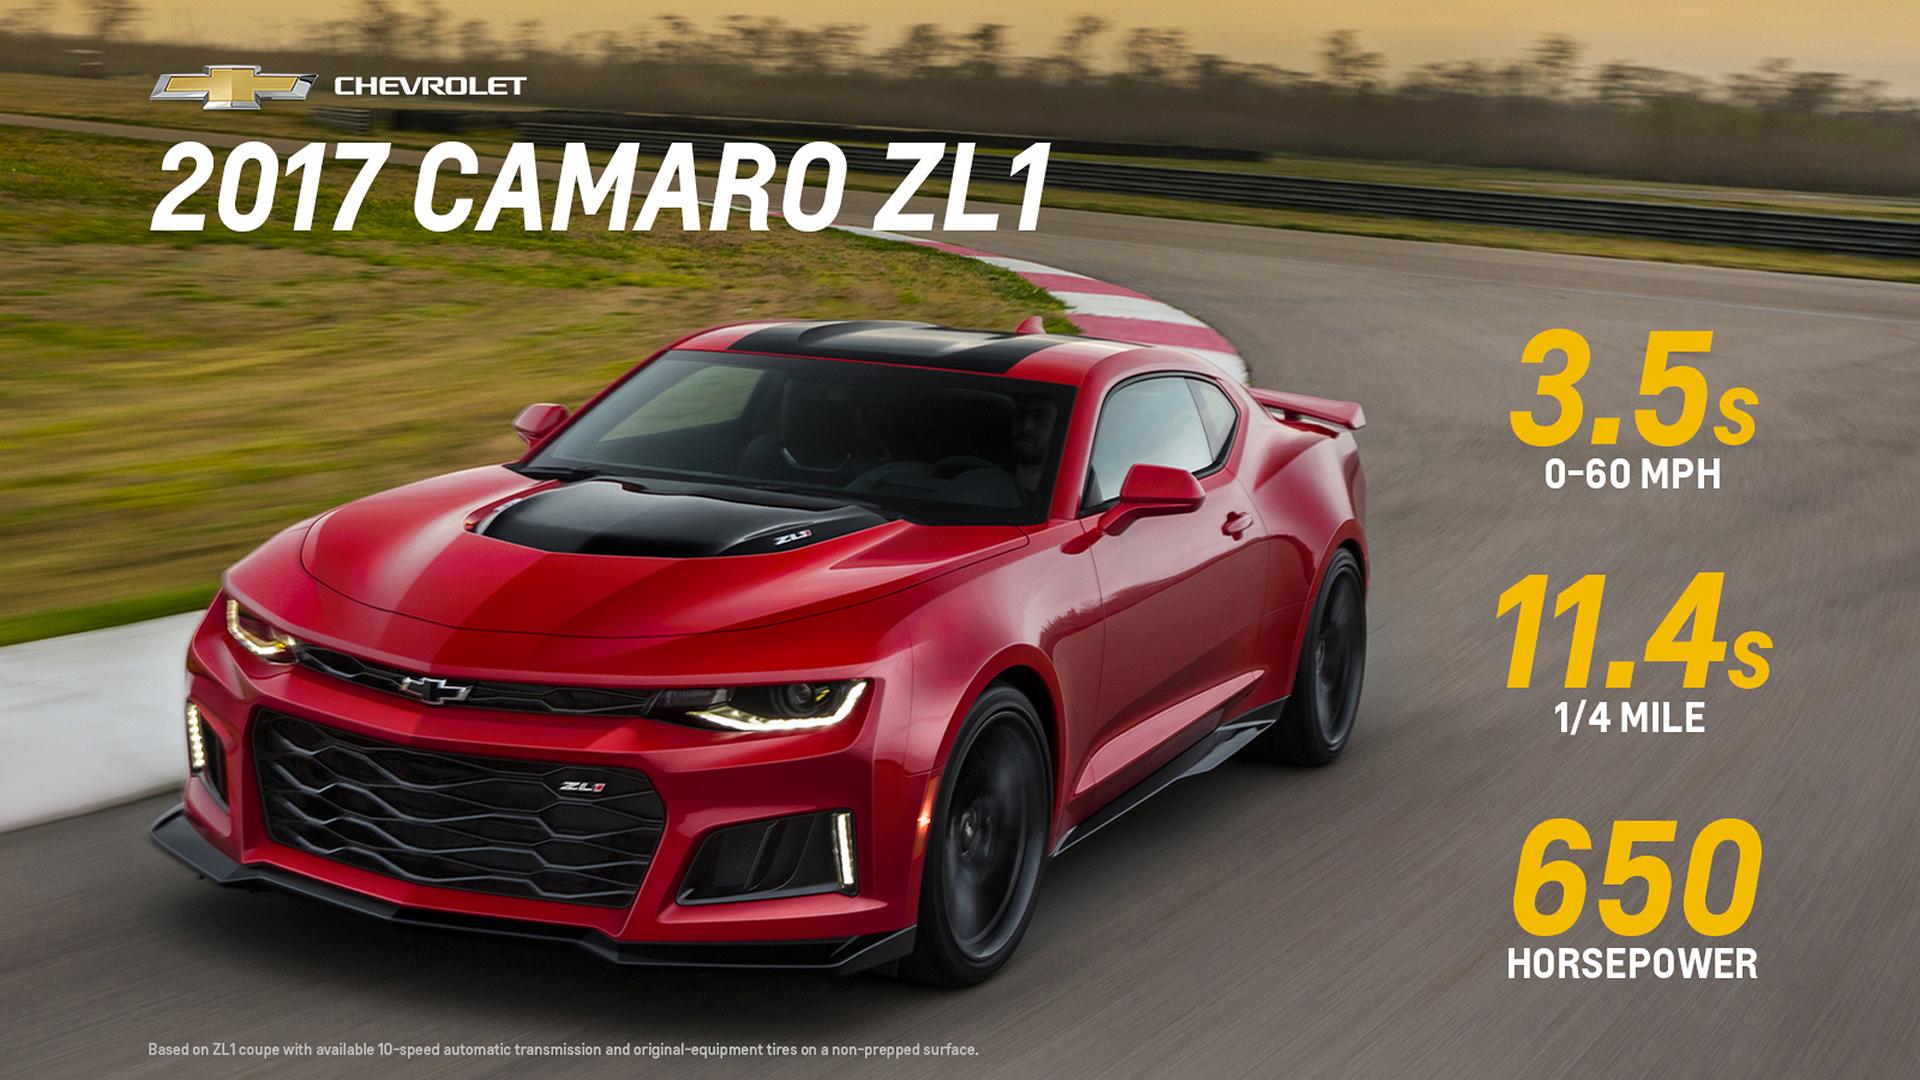 2017 Chevrolet Camaro ZL1 © General Motors